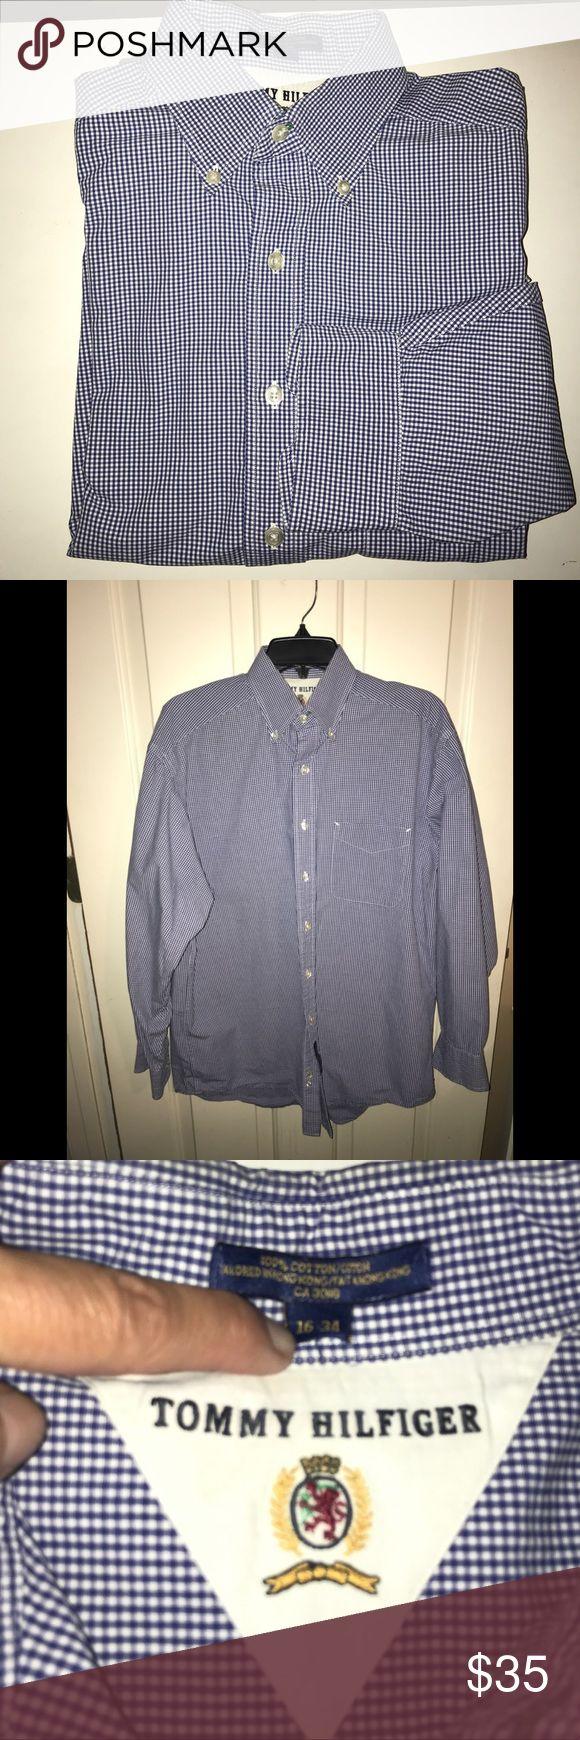 EUC💜TOMMY HILFIGER💜Checkered Casual Shirt EUC💜TOMMY HILFIGER 💜White / Blue Checkered Button down Long Sleeve Casual Dress Shirt. Size - 16 Neck, 34 Sleeve.  100 % Cotton. Original cost $95 Tommy Hilfiger Shirts Casual Button Down Shirts